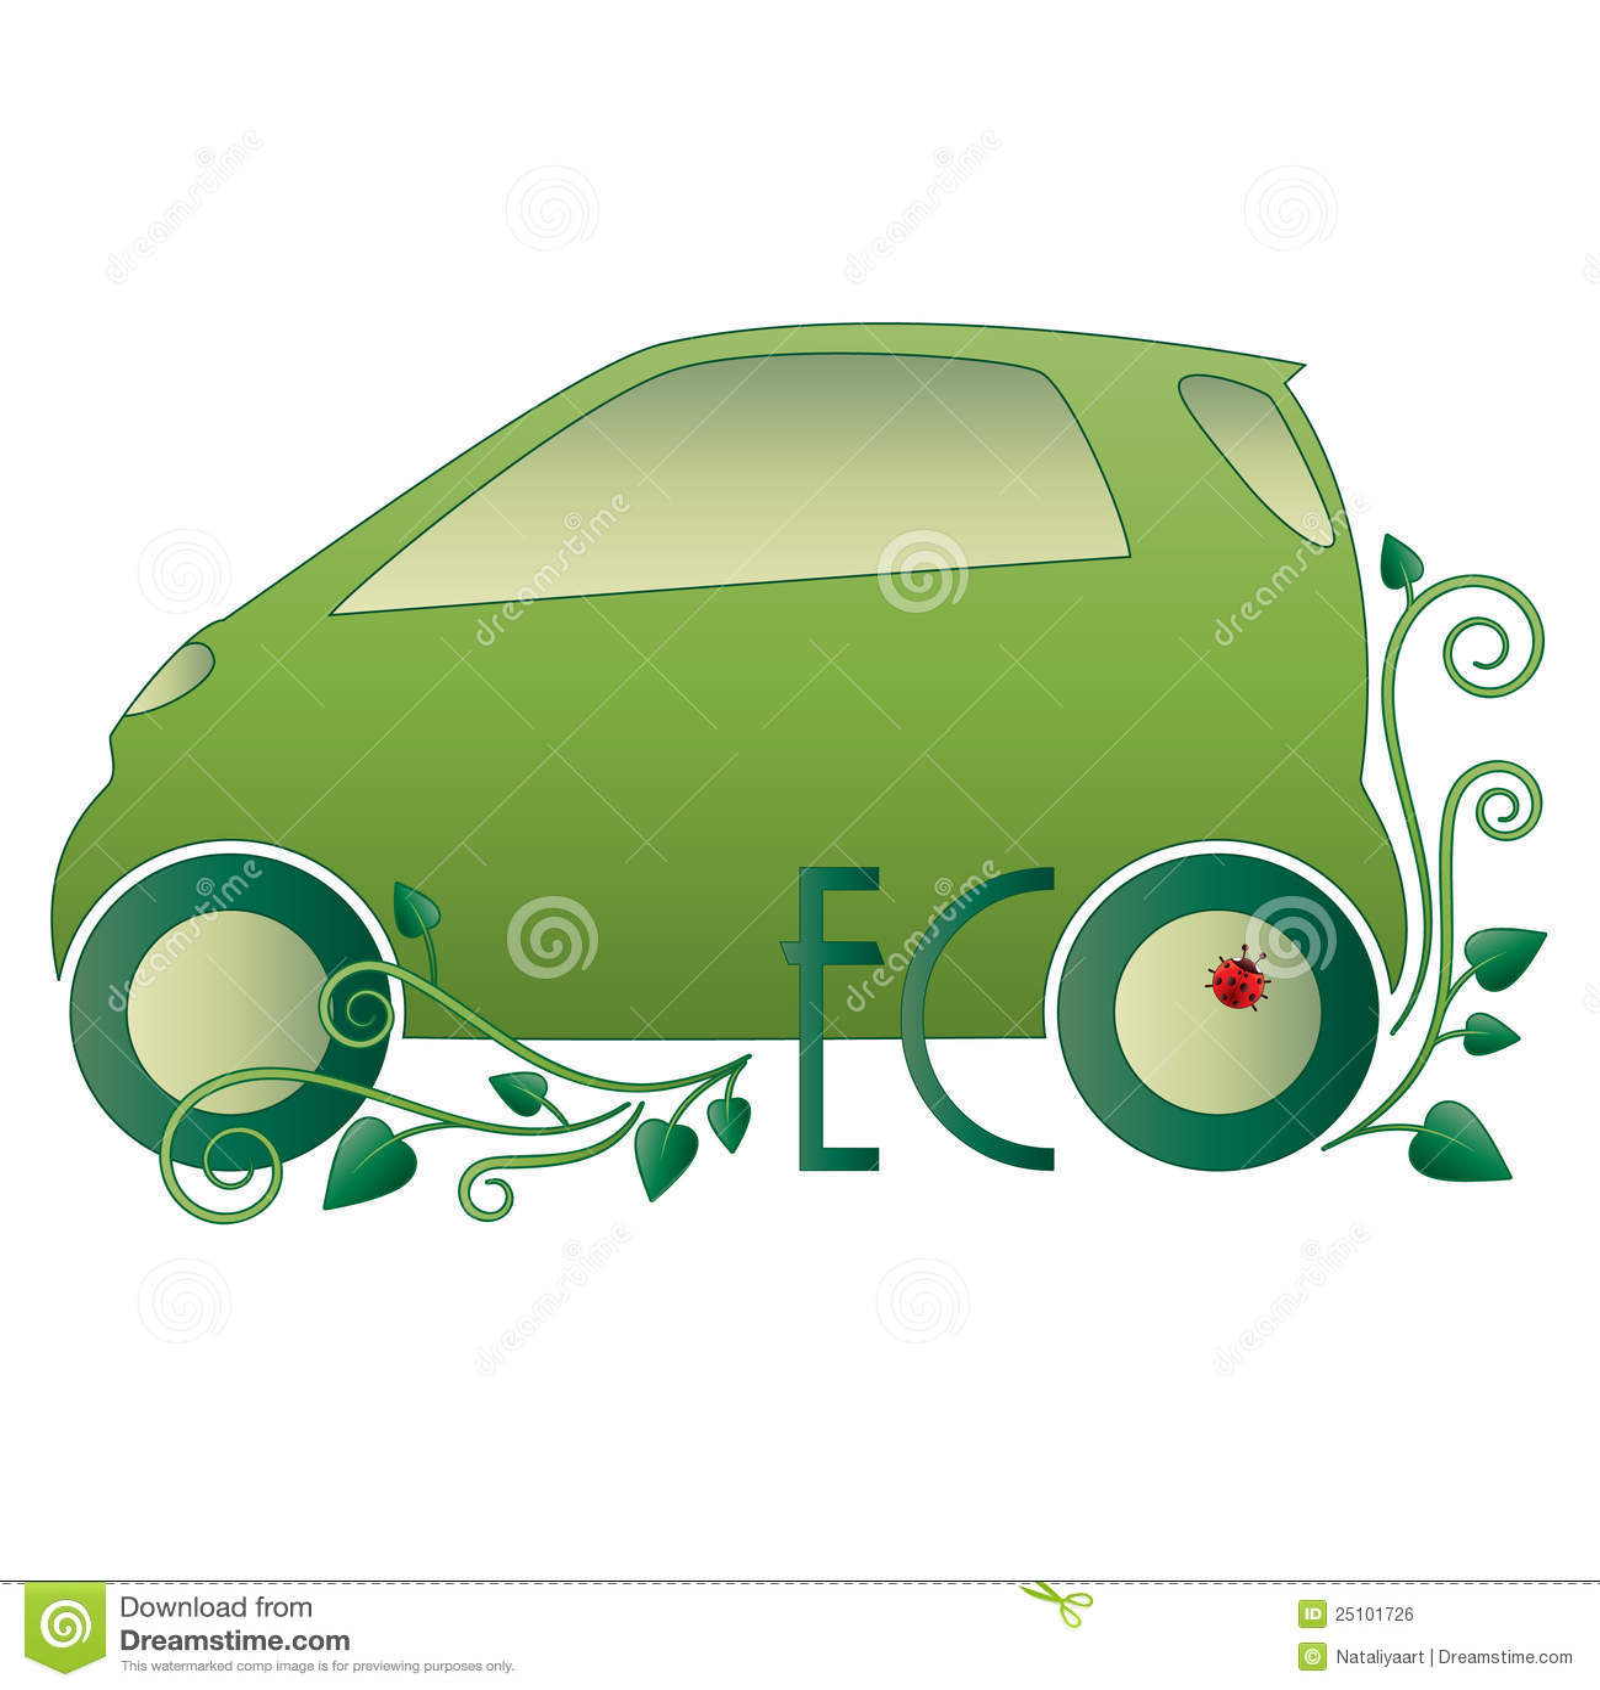 Eco Car Royalty Free Stock Image - Image: 25101726